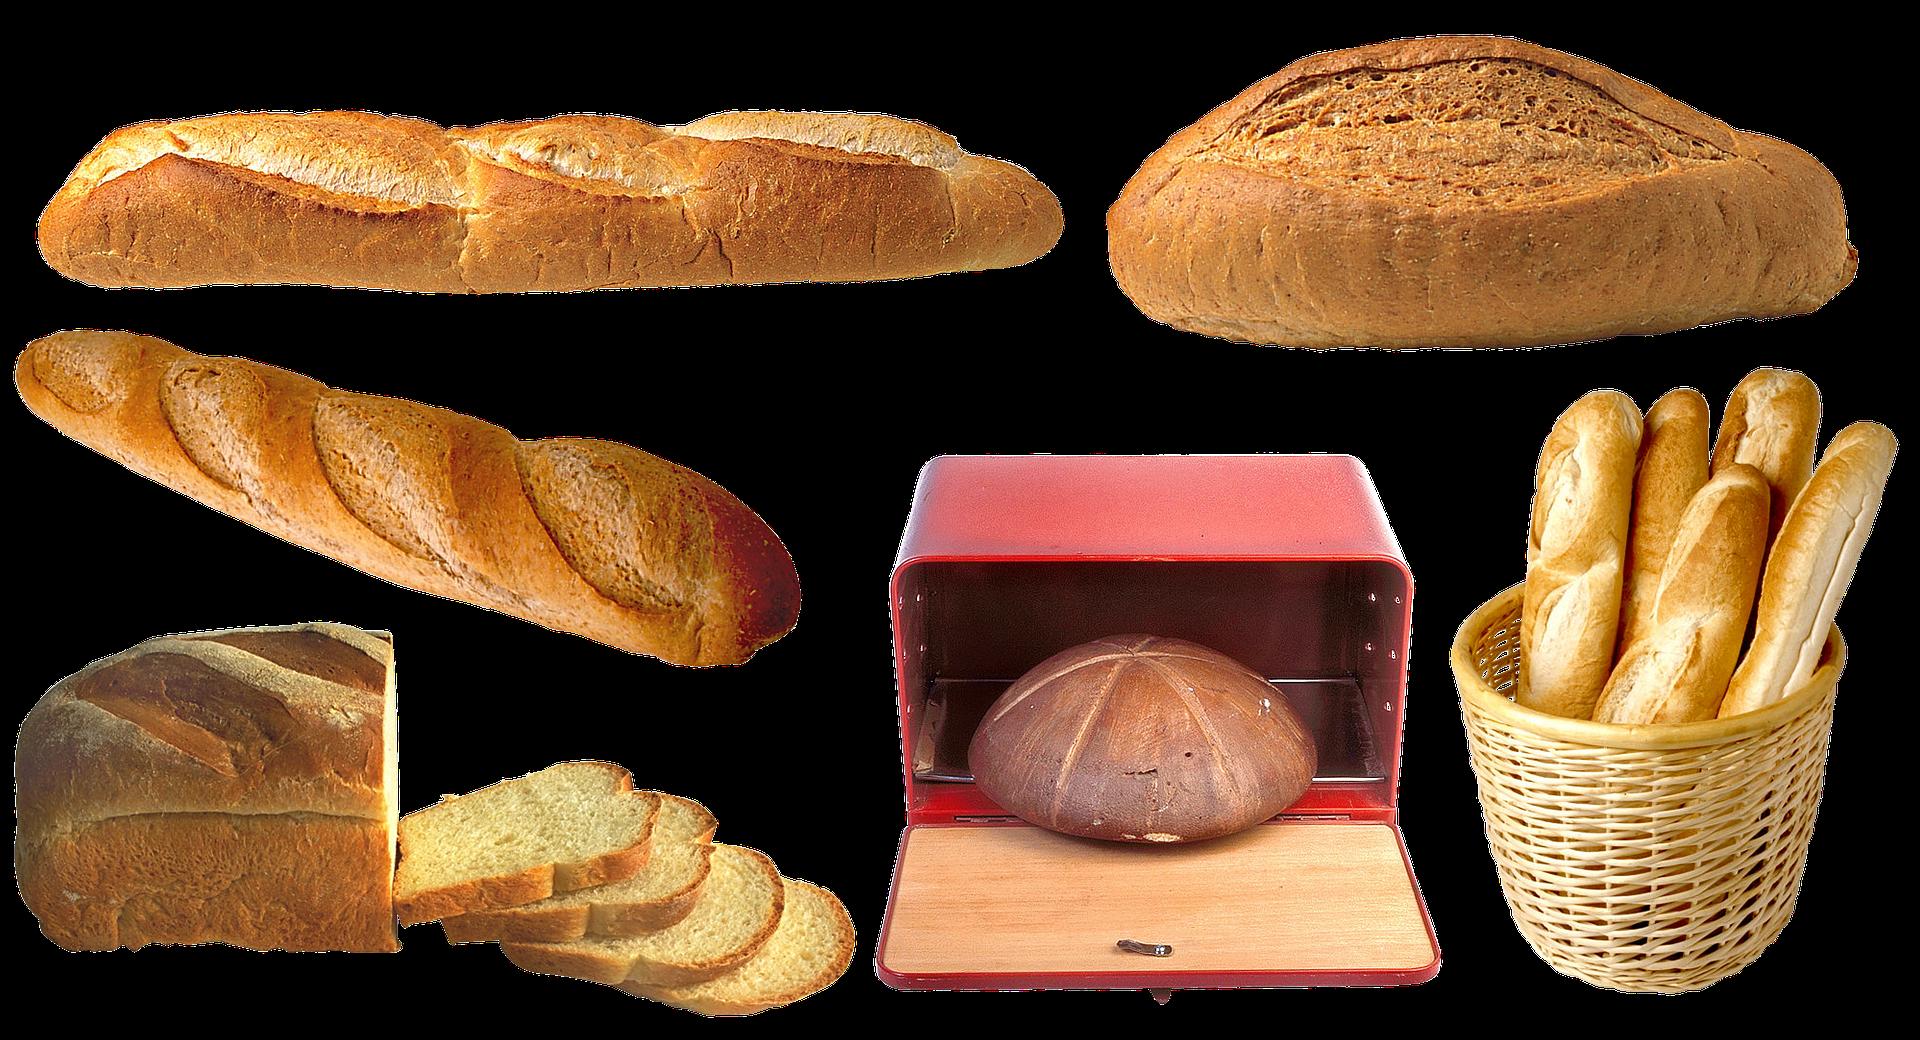 Bread from the Bakery, Bake, Baked, Bakery, Bread, HQ Photo